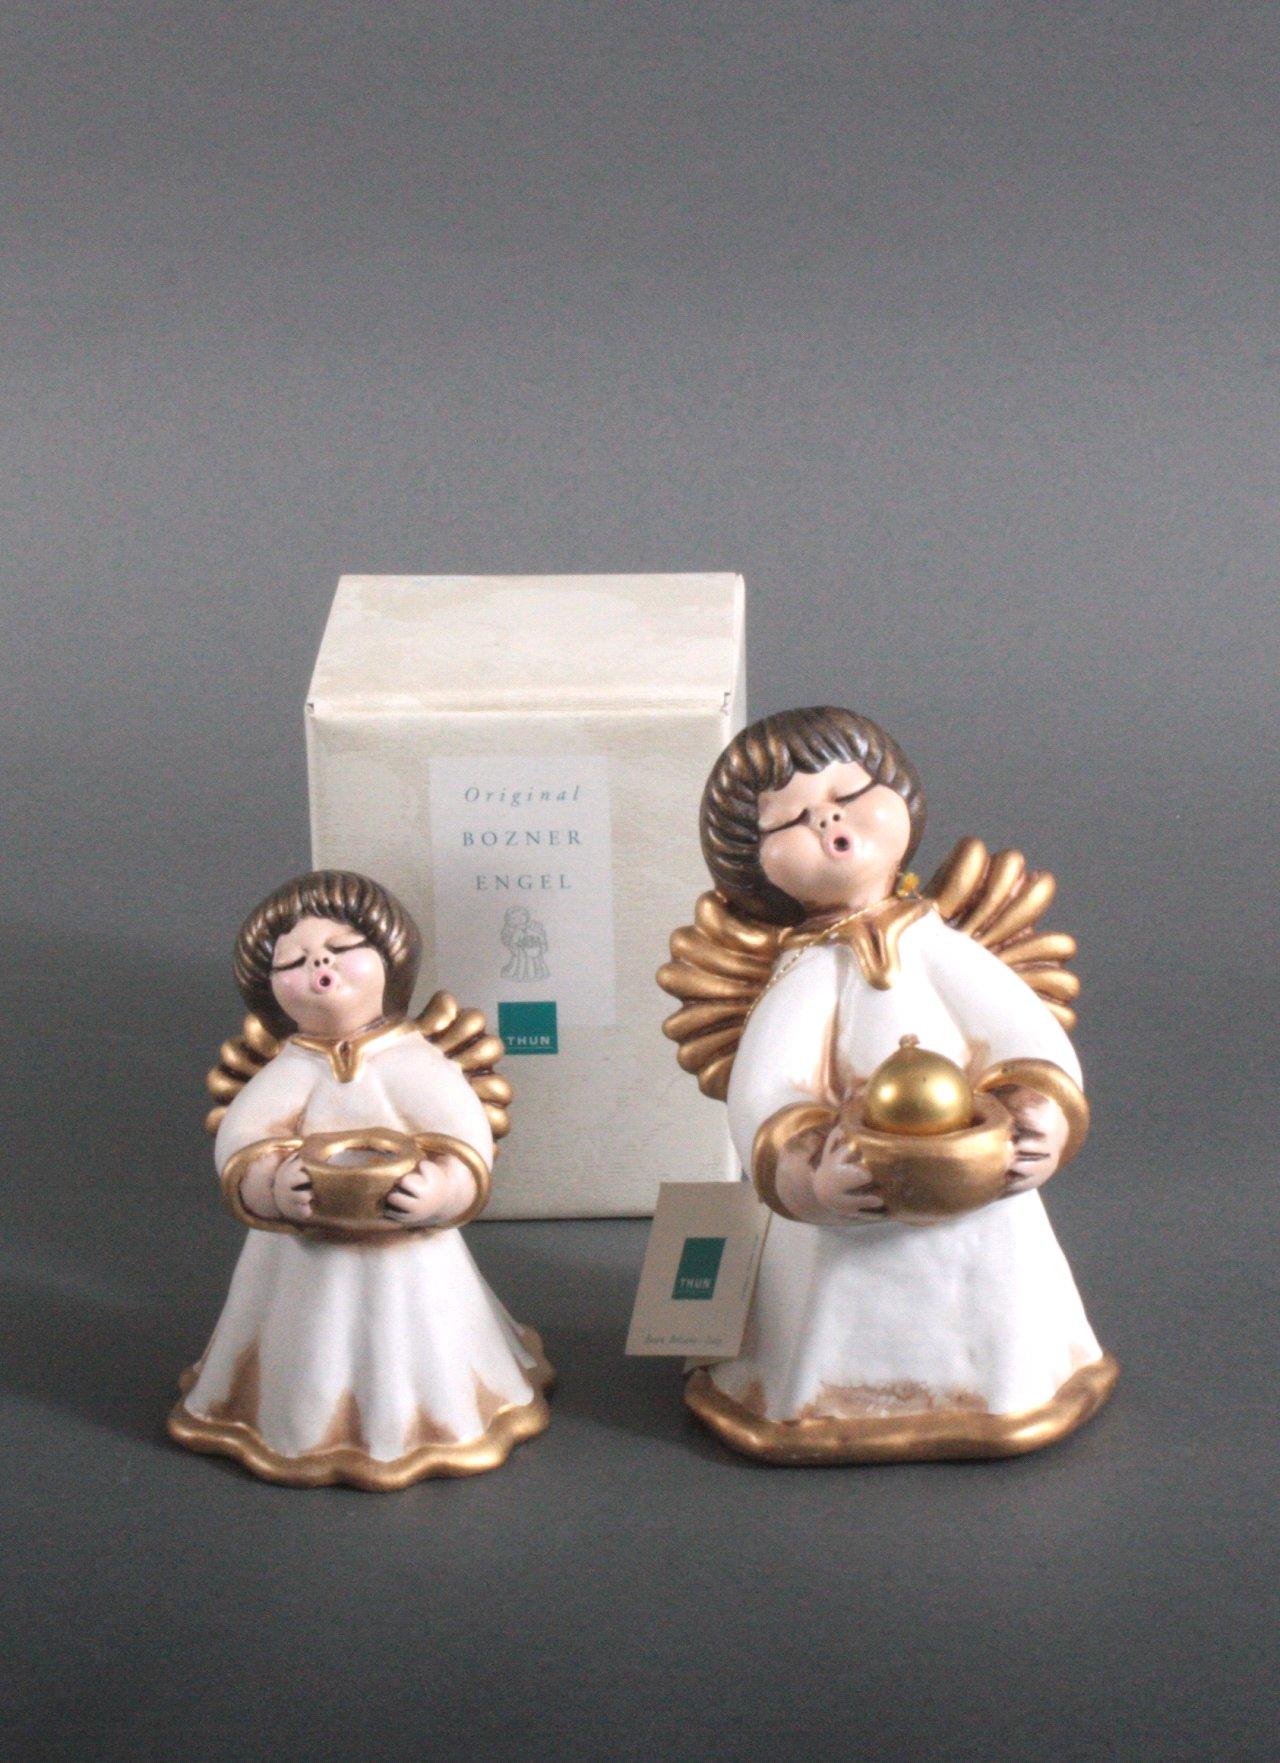 2 Bozner Engel der Marke Thun